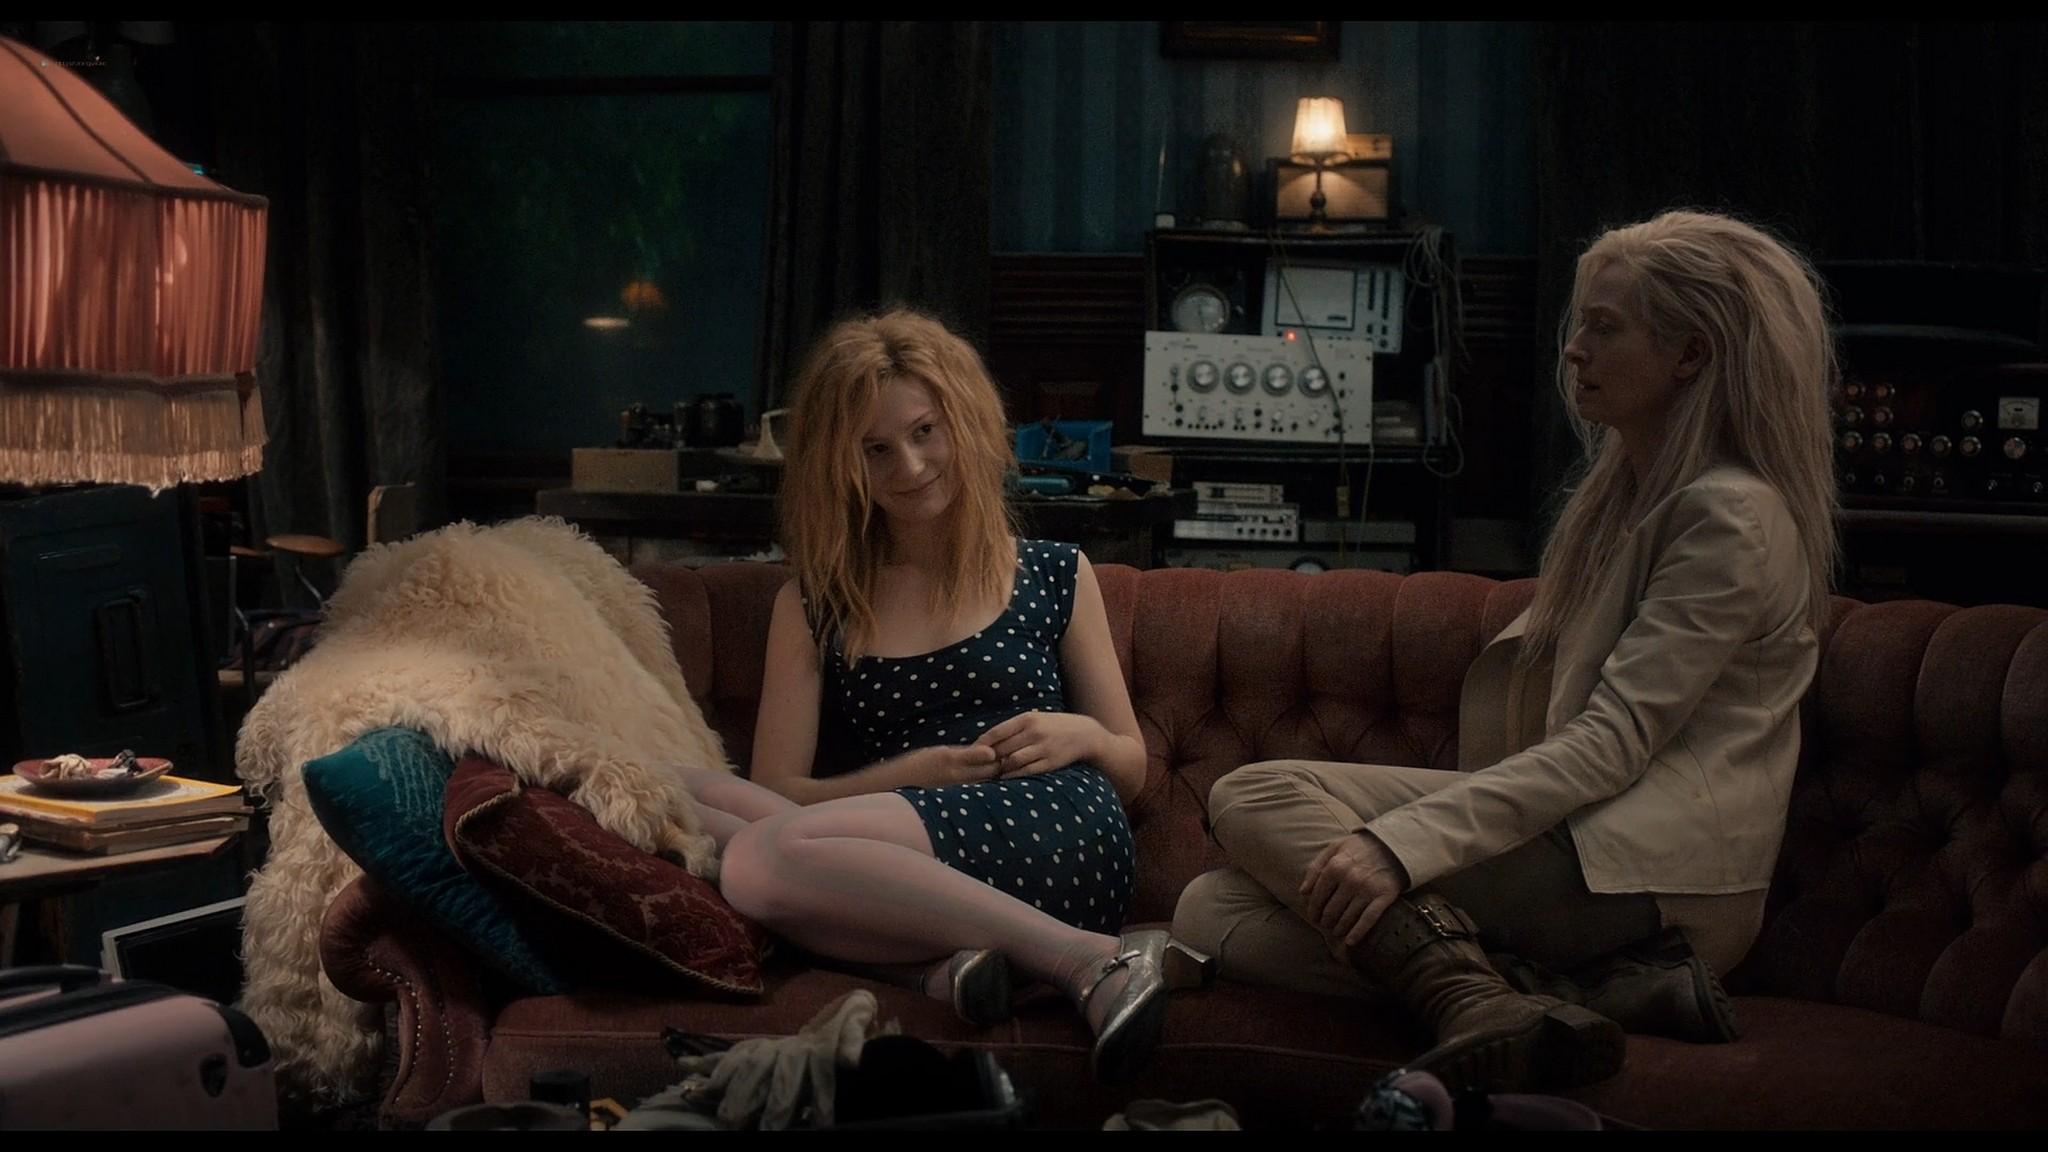 Tilda Swinton nude Mia Wasikowska sexy Only Lovers Left Alive 2013 HD 1080p BluRay 5